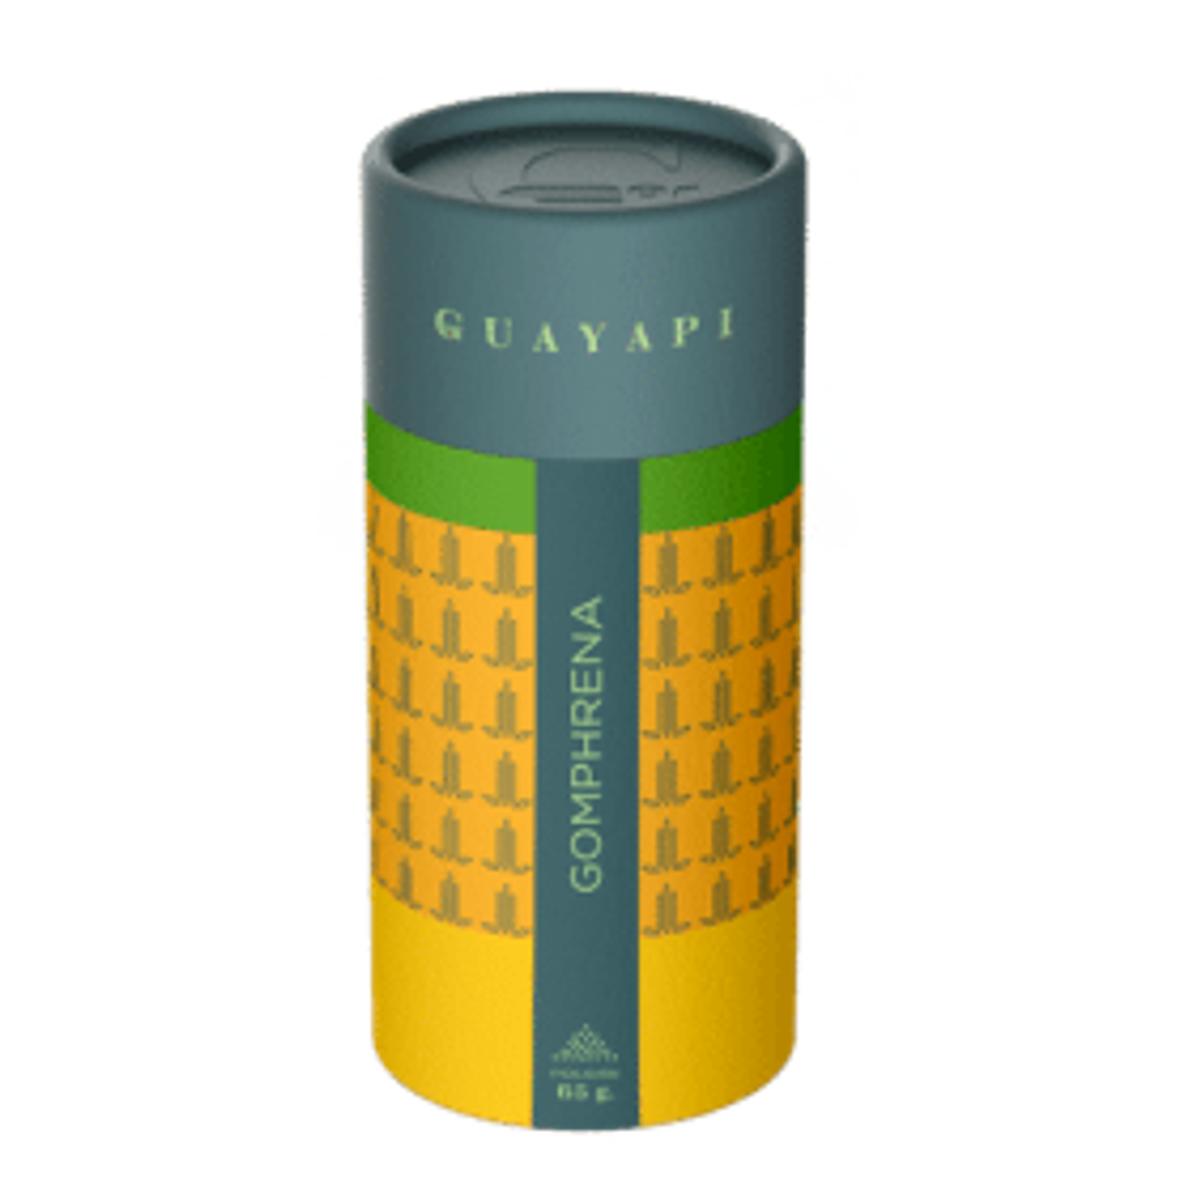 PROMO DÉCOUVERTE - Guayapi Gomphrena poudre - 65 g